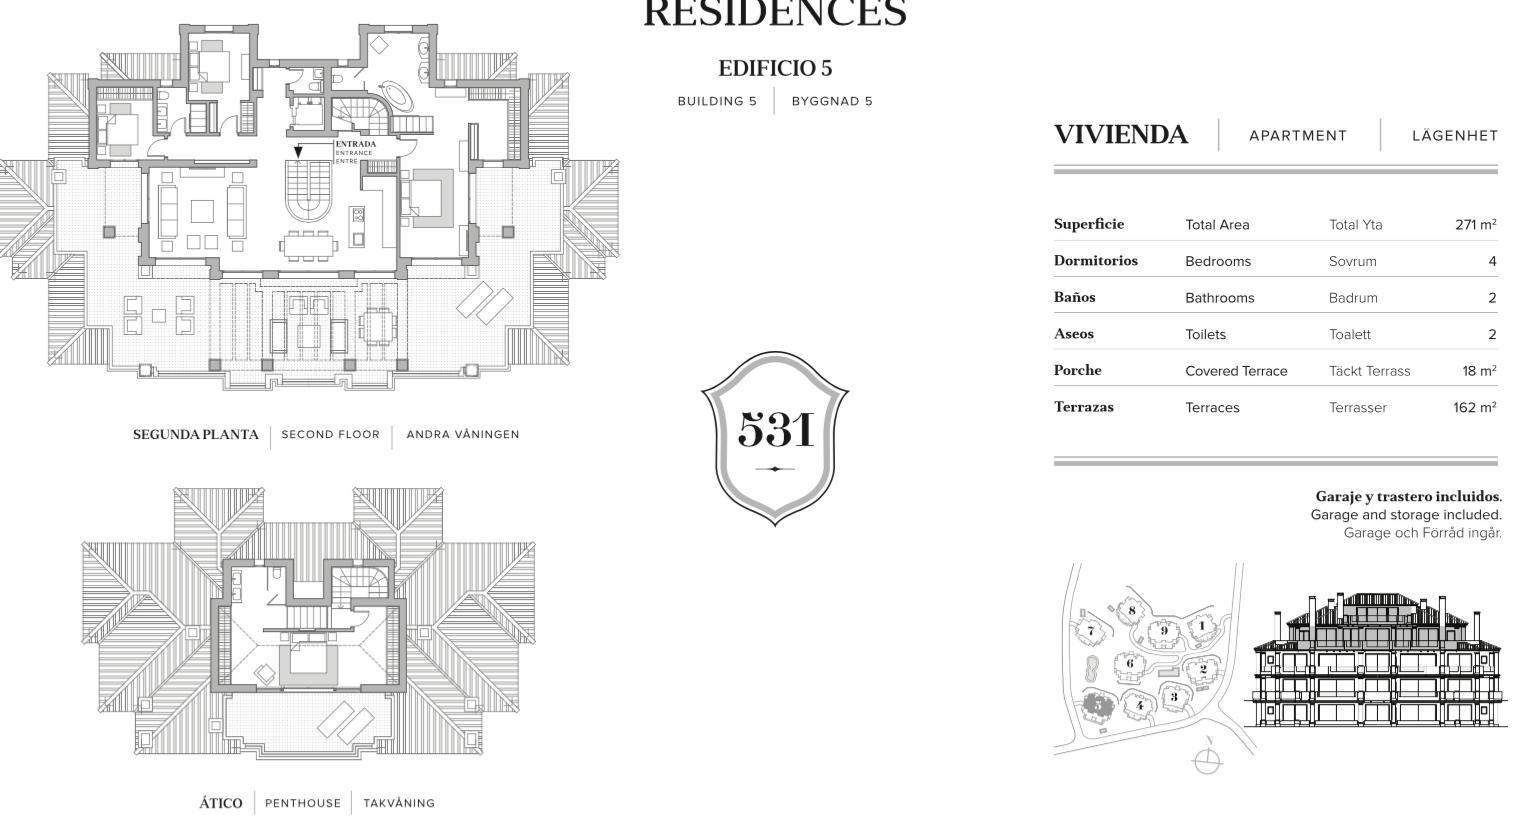 nine lions residences appartementen penthouses te koop nueva andalucia grondplan penthouse 4 slaapkamers